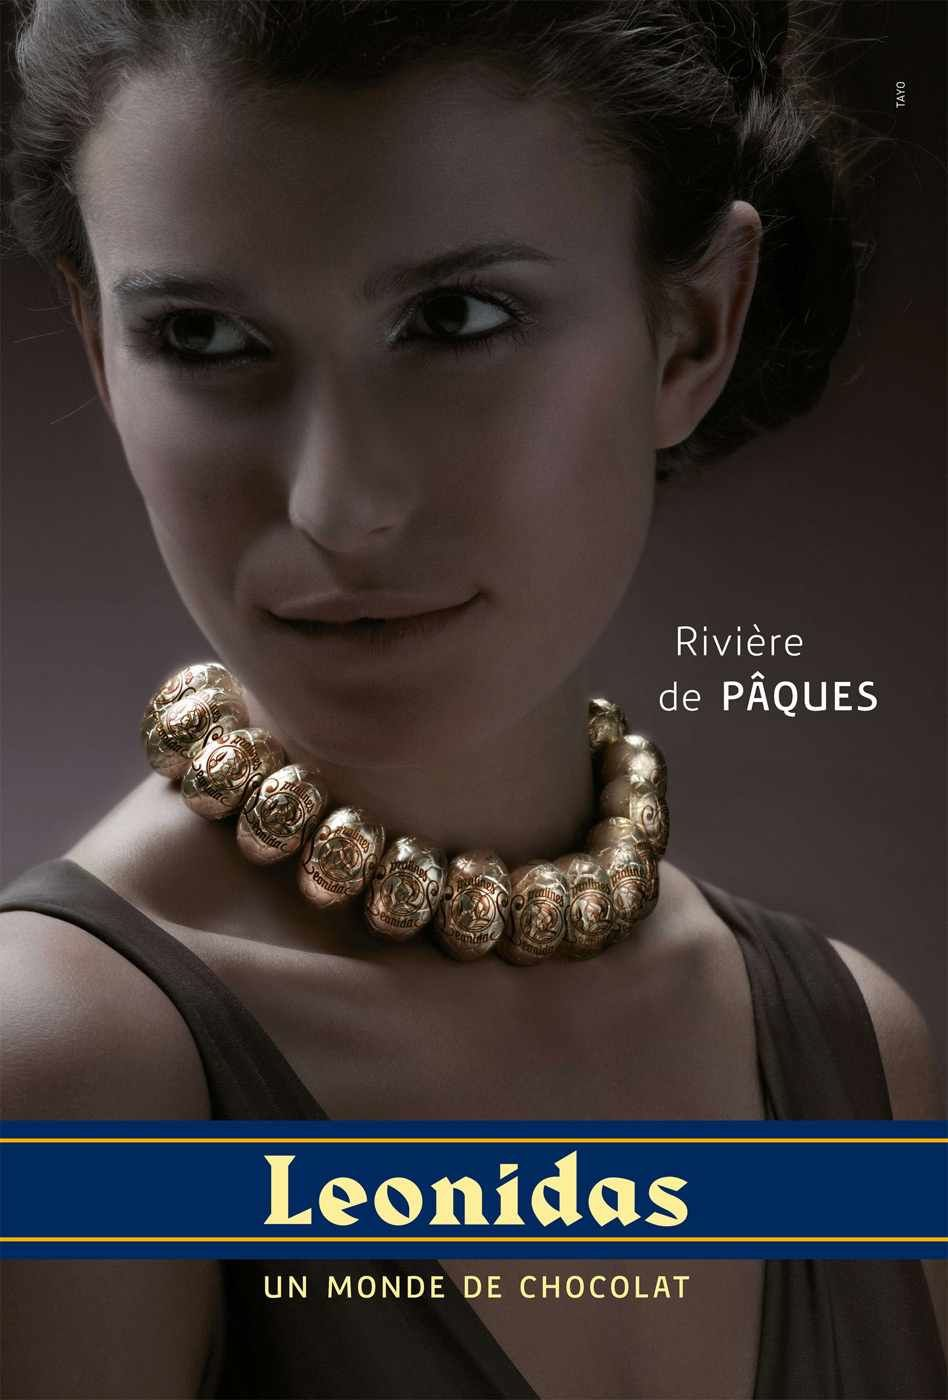 Agence : Tayo, Waterloo, Belgique, pour les chocolats Leonidas (mars 2010)